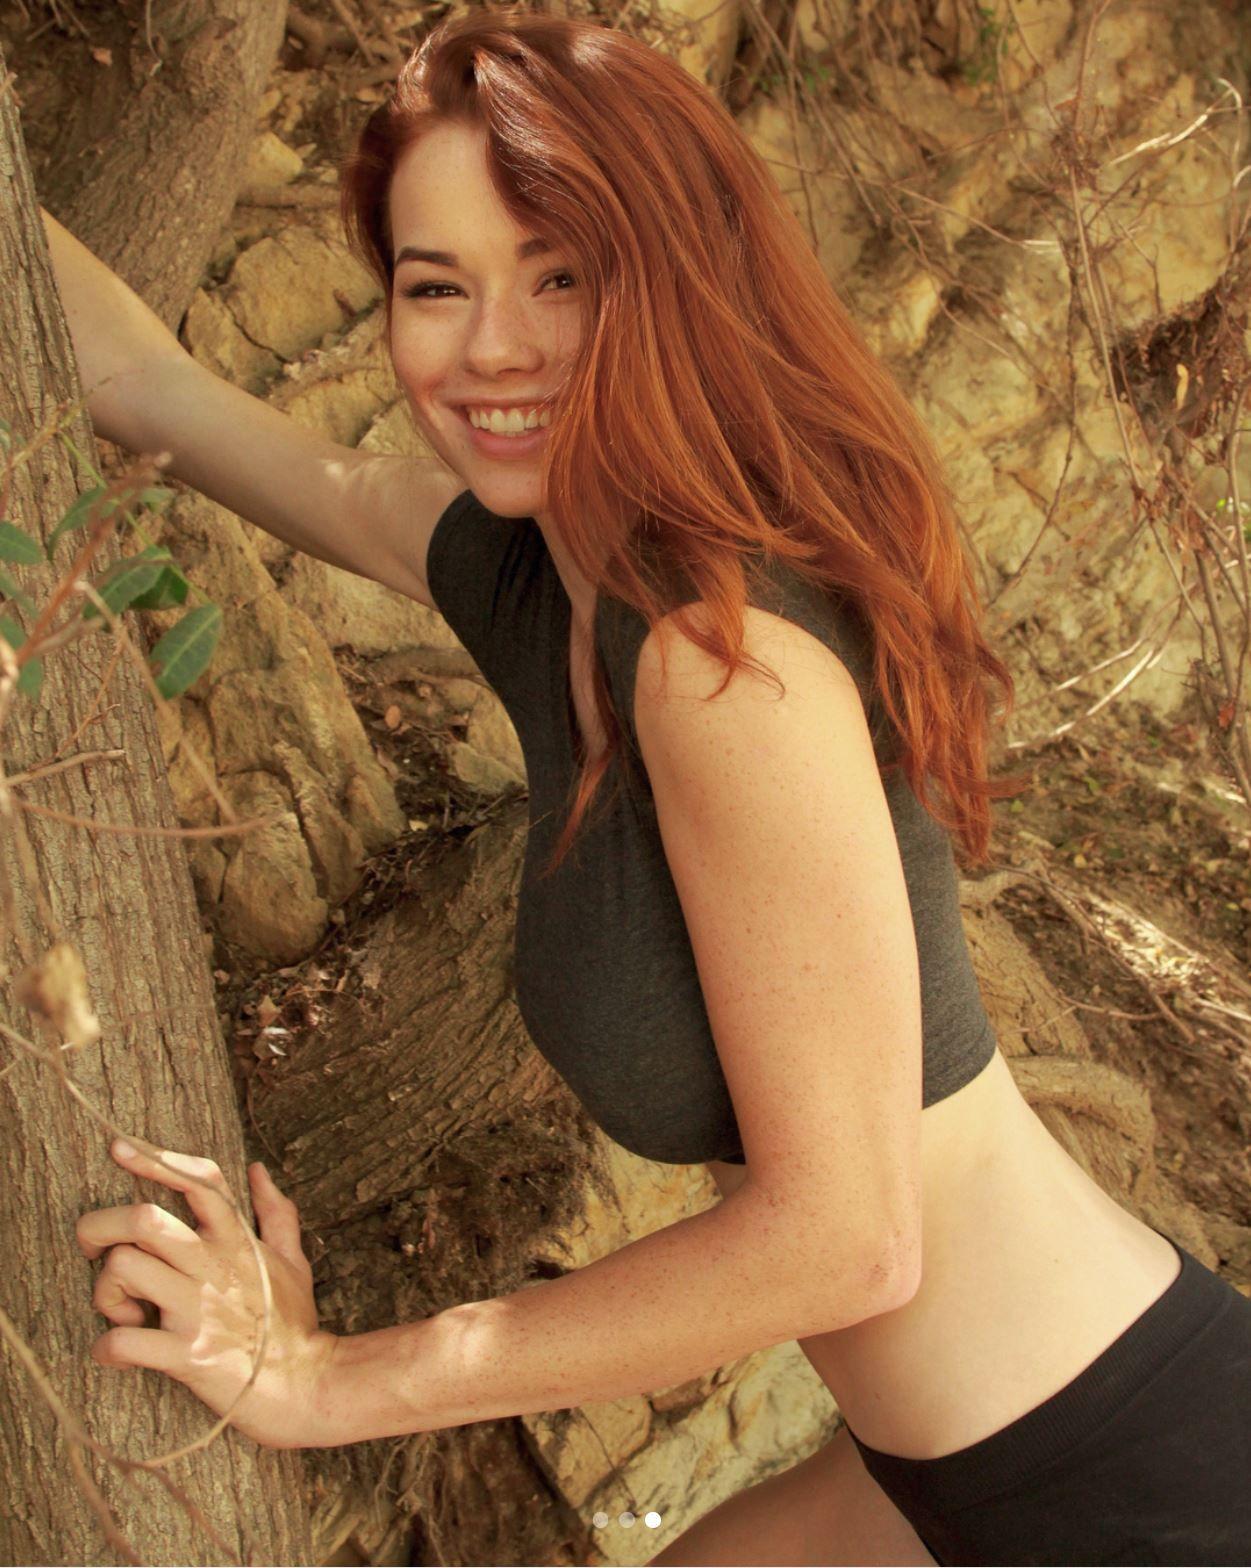 People 1251x1568 women model redhead long hair Sabrina Lynn freckles portrait display smiling women outdoors trees sportswear branch